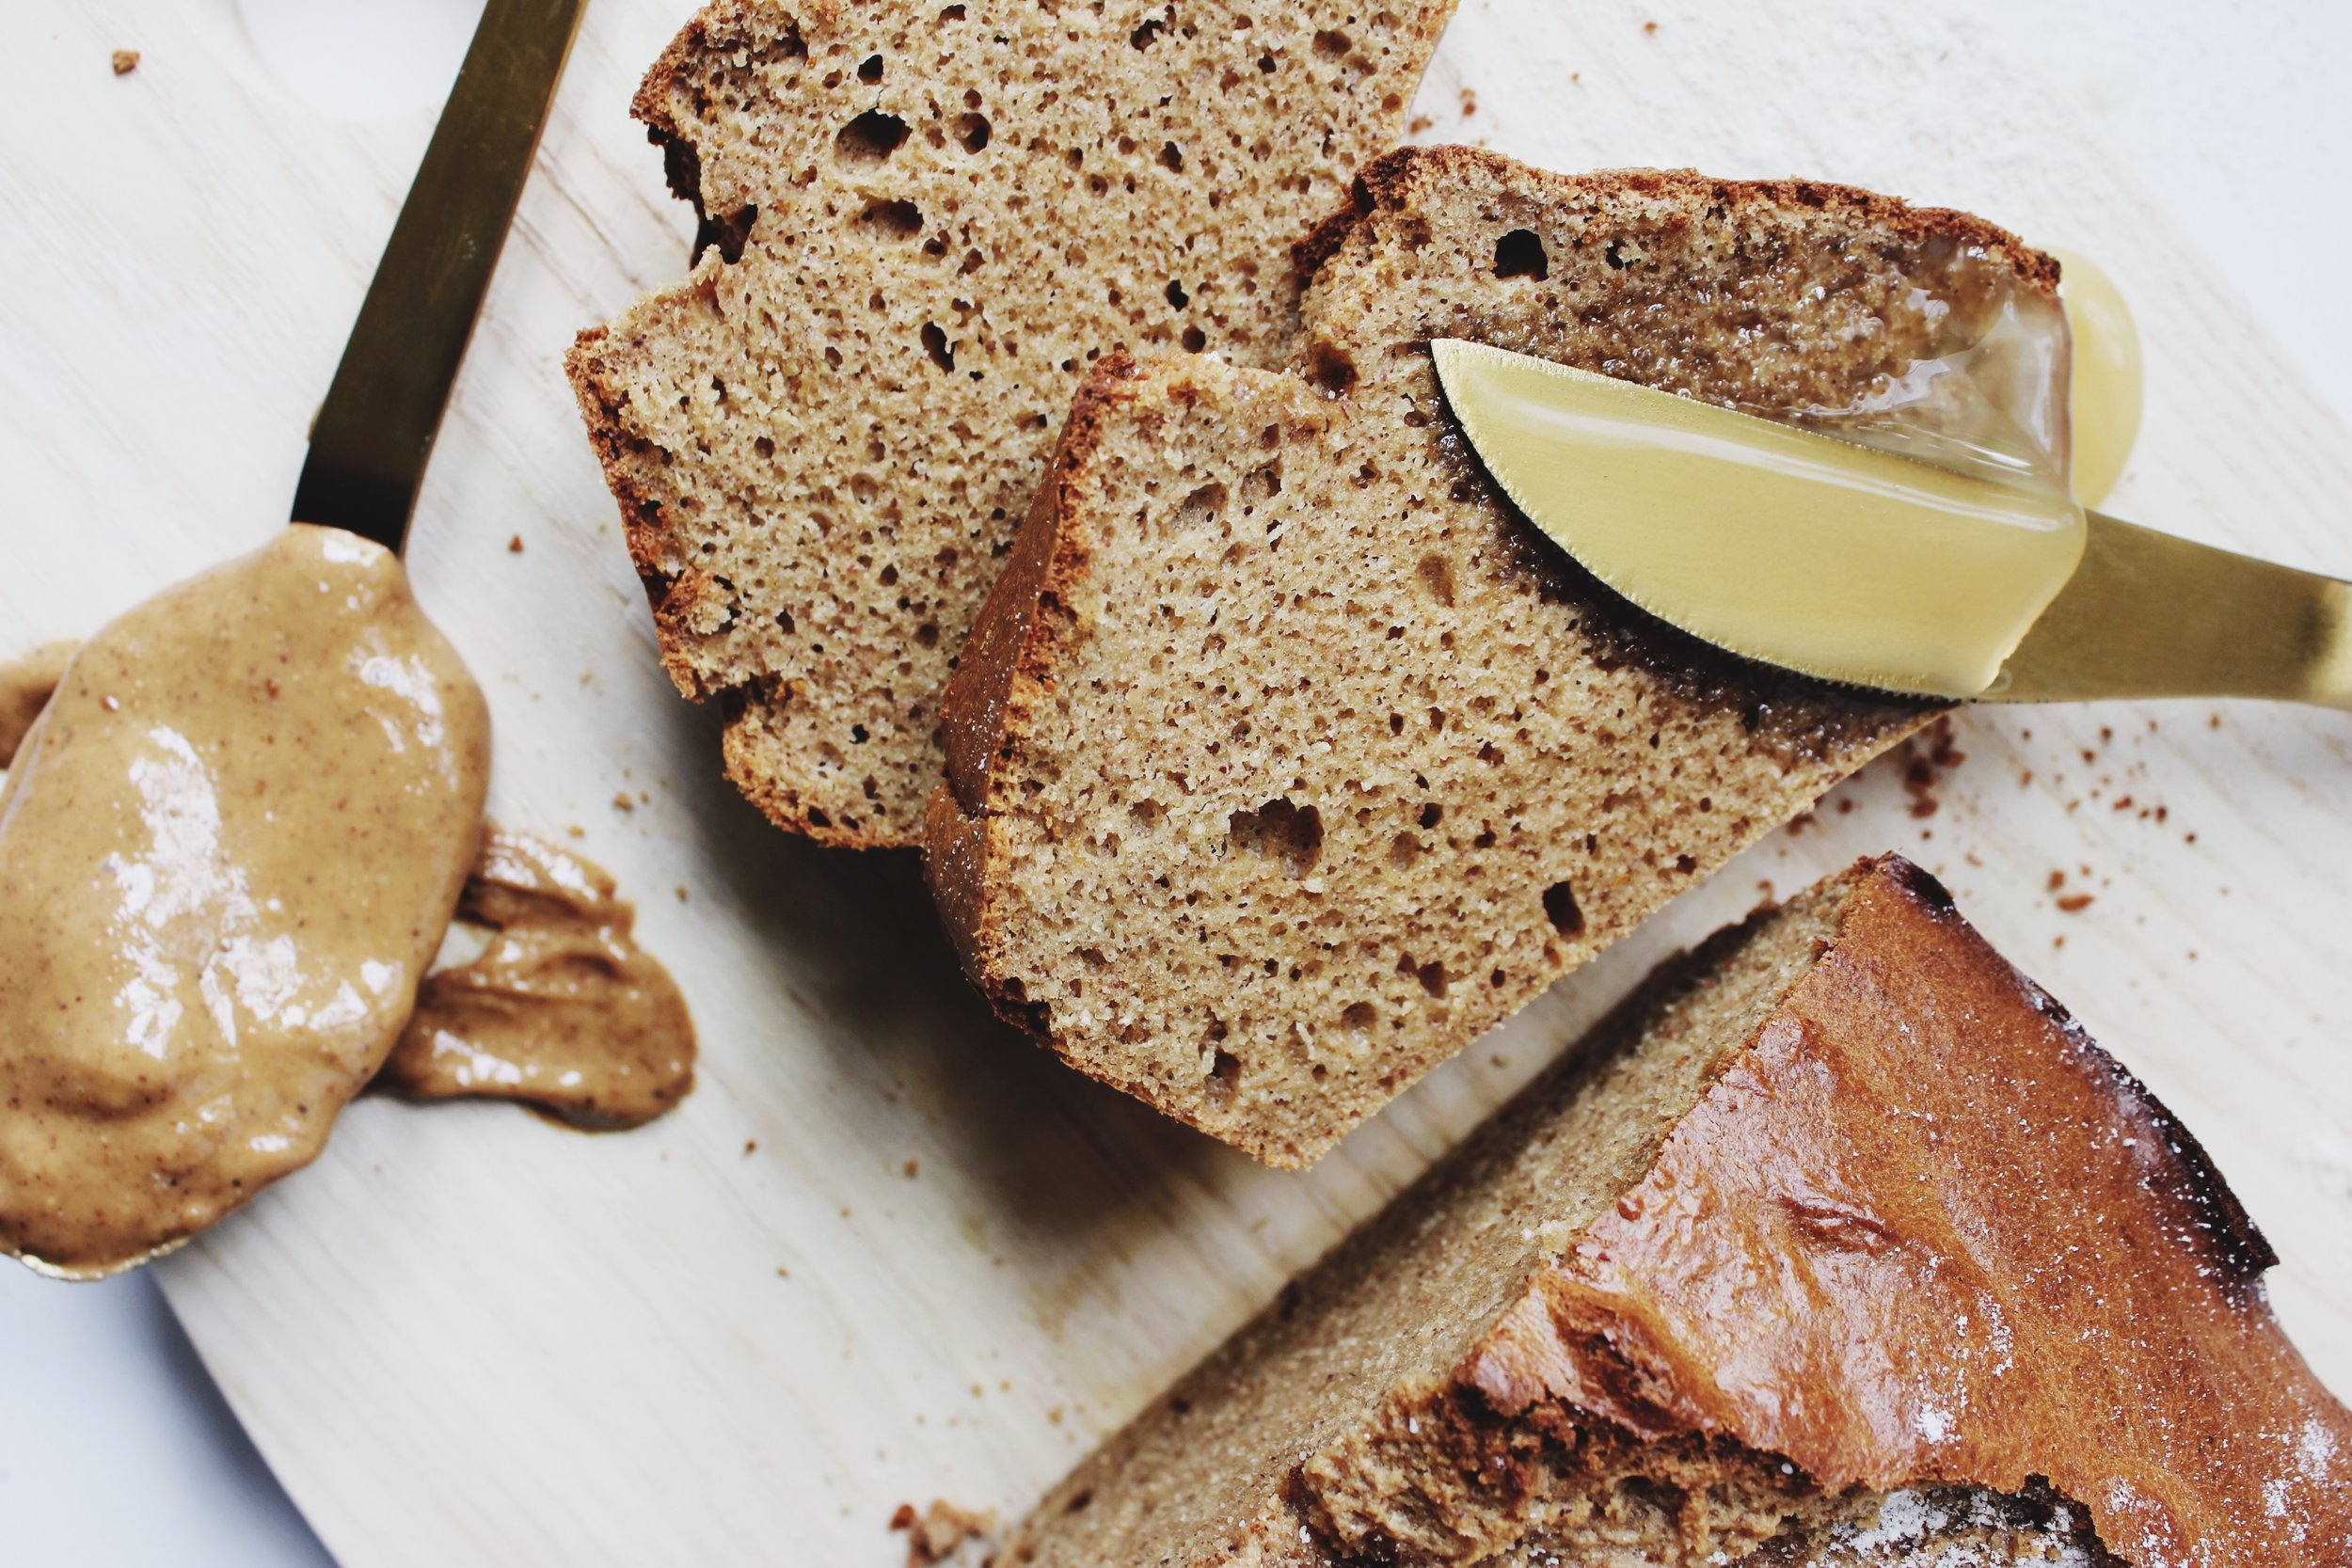 verdens bedste glutenfrie brød